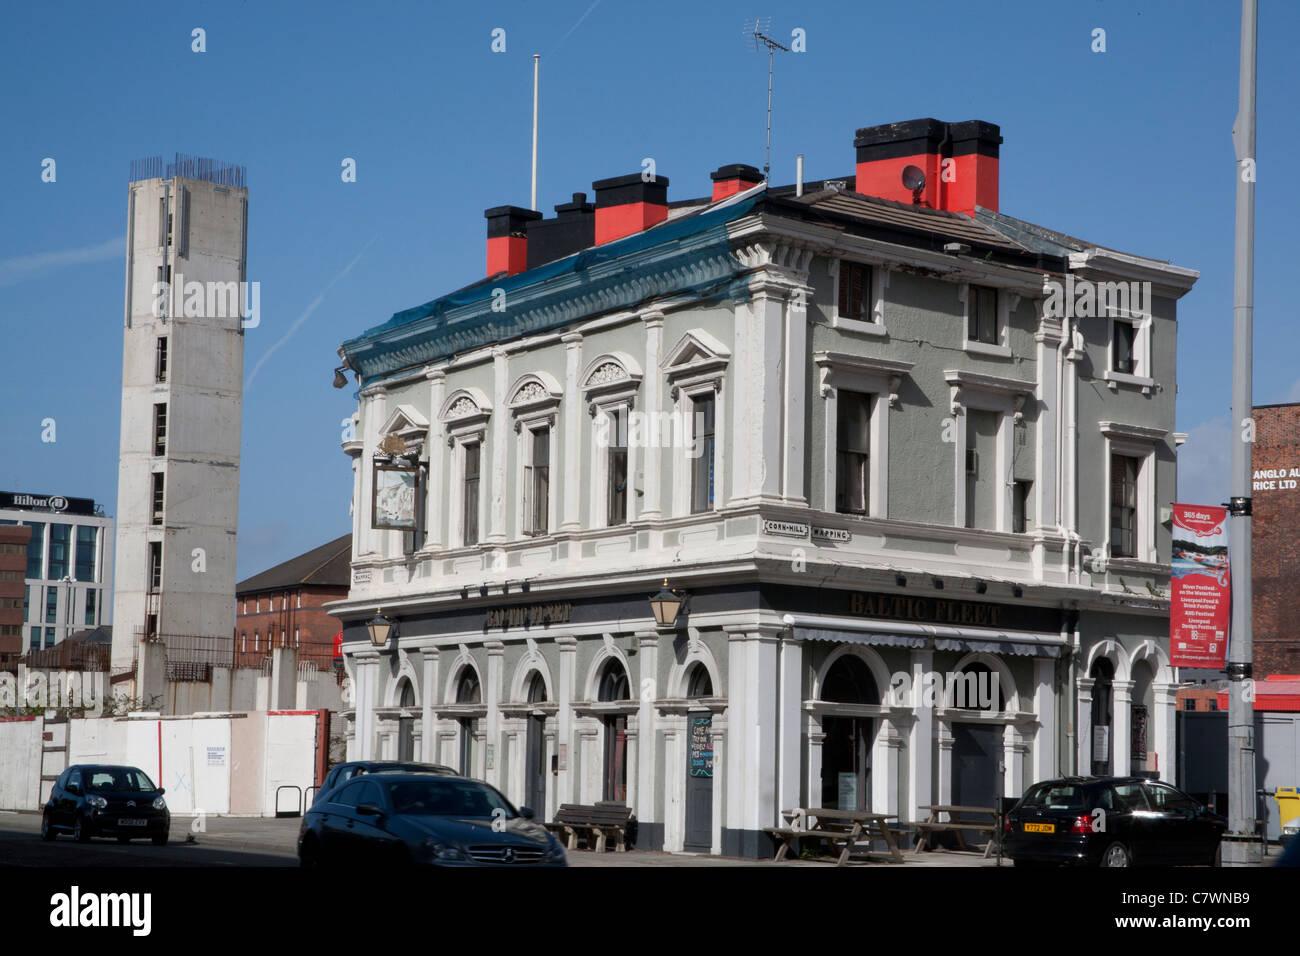 Baltic Fleet Pub, Liverpool, Merseyside, Liverpool England UK Stock Photo